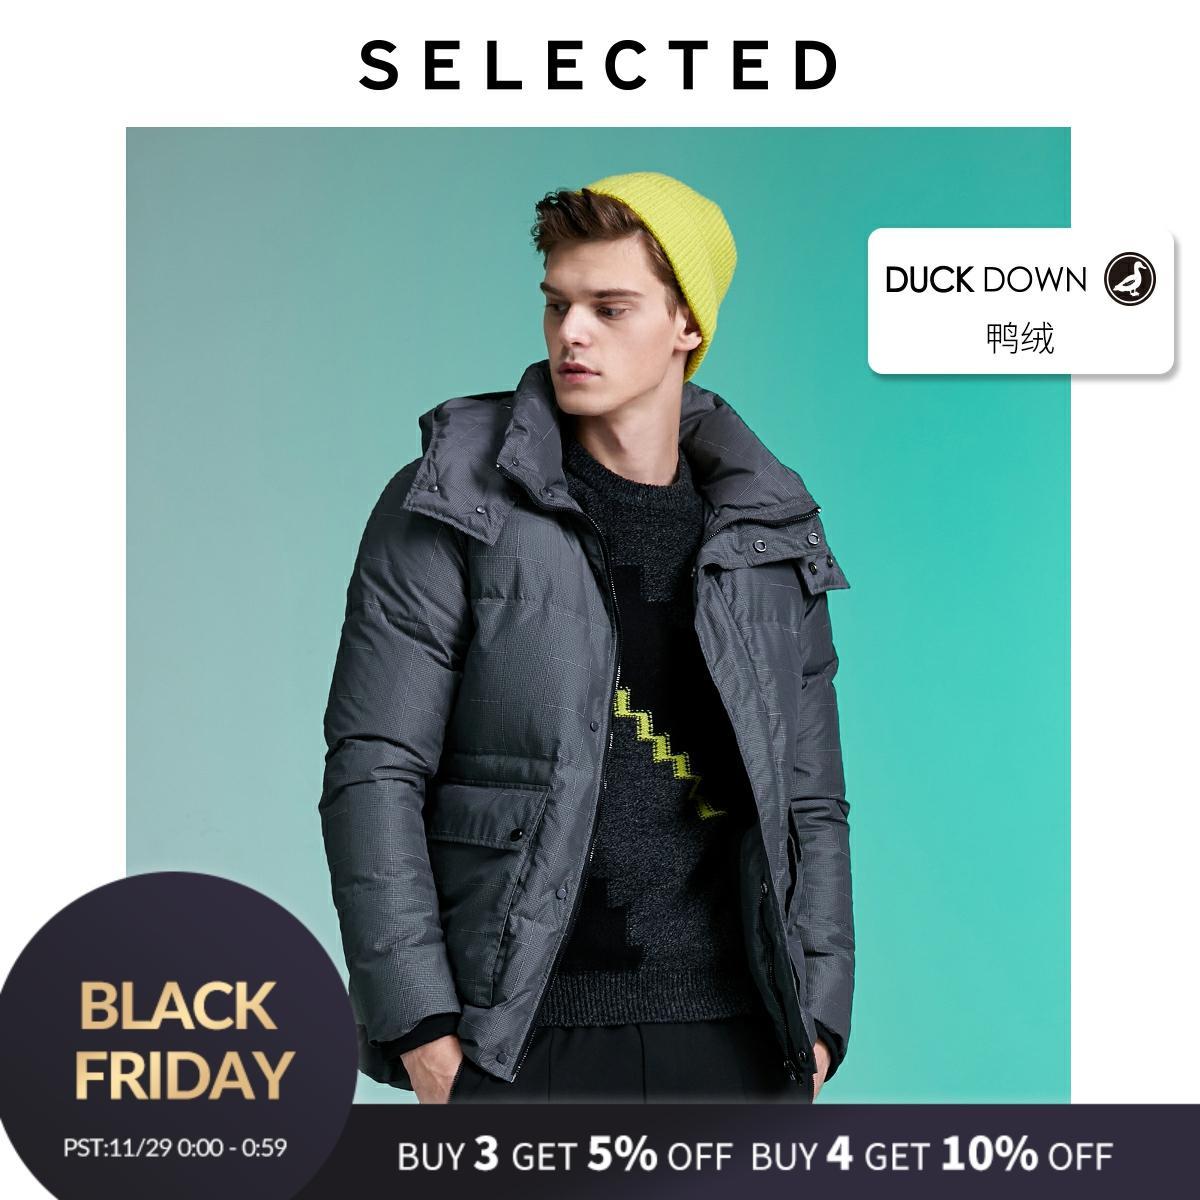 SELECTED Men's Contrasting Plaid Down Jacket Winter Outwear Coat L|419412570